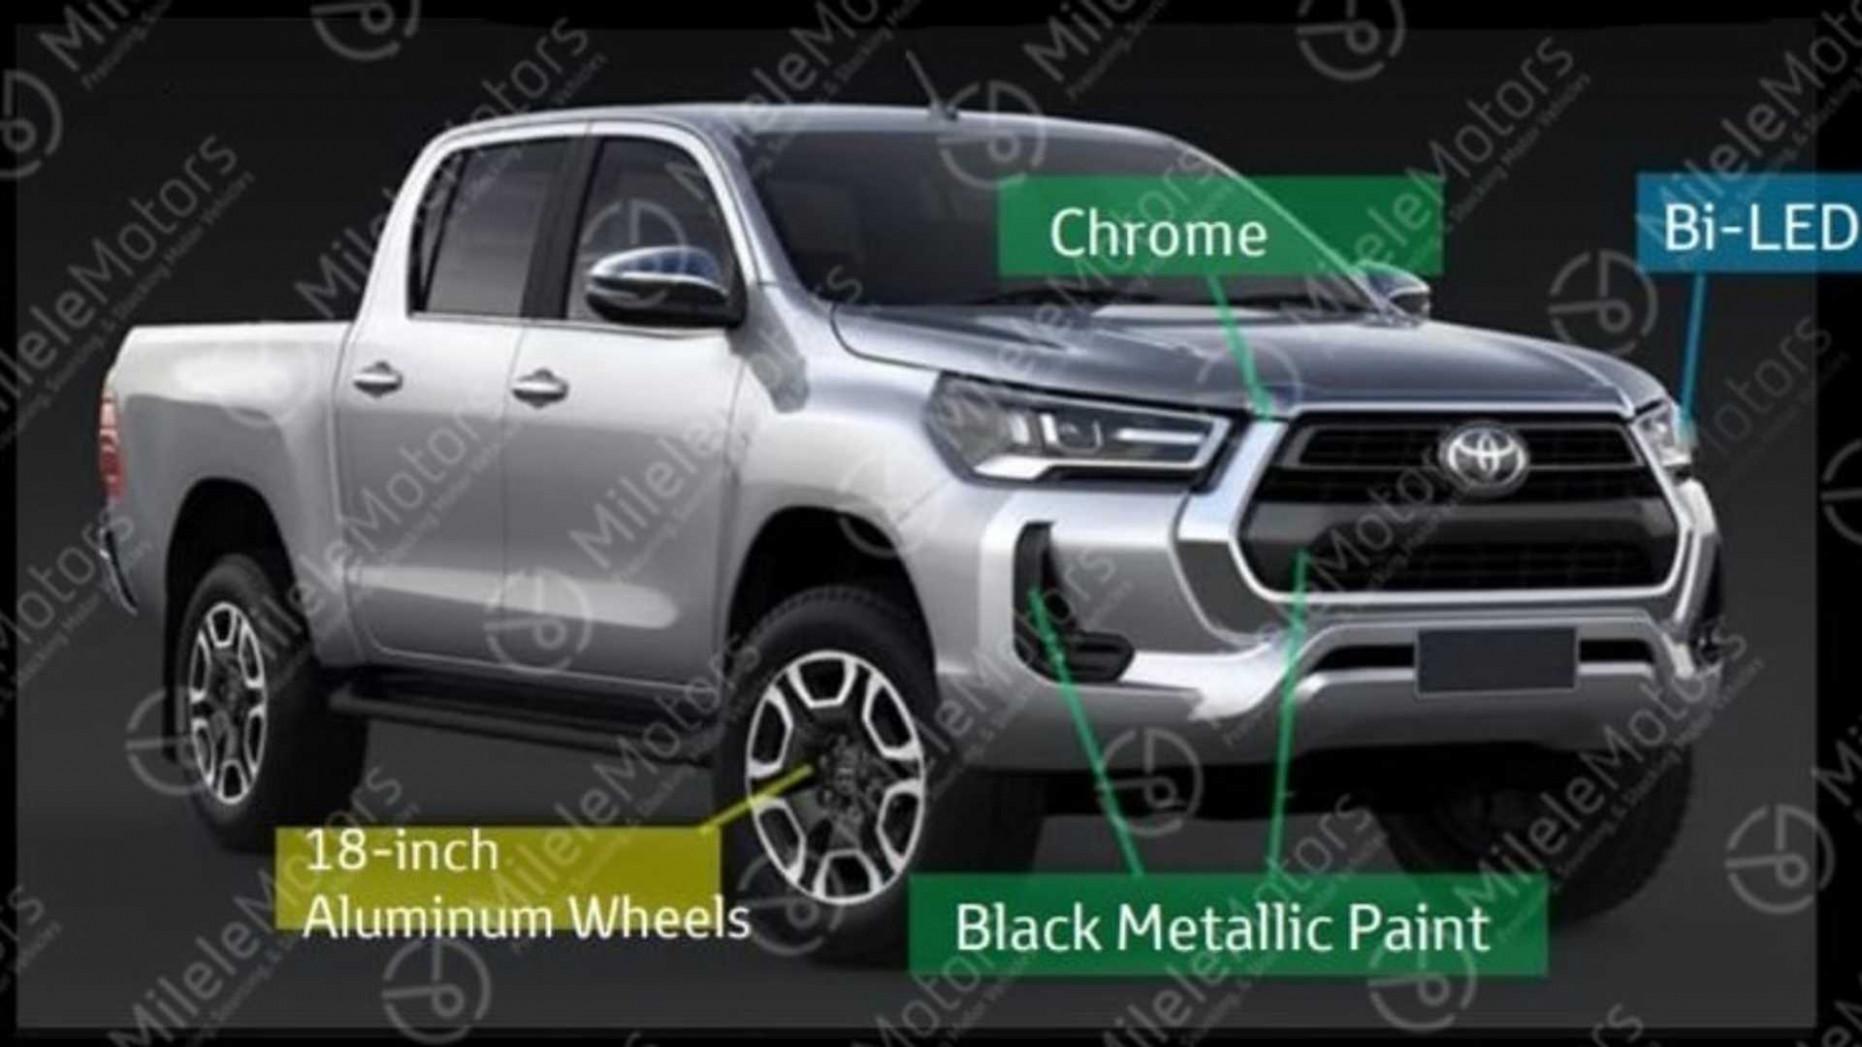 New Concept 2022 Toyota Hilux Spy Shots